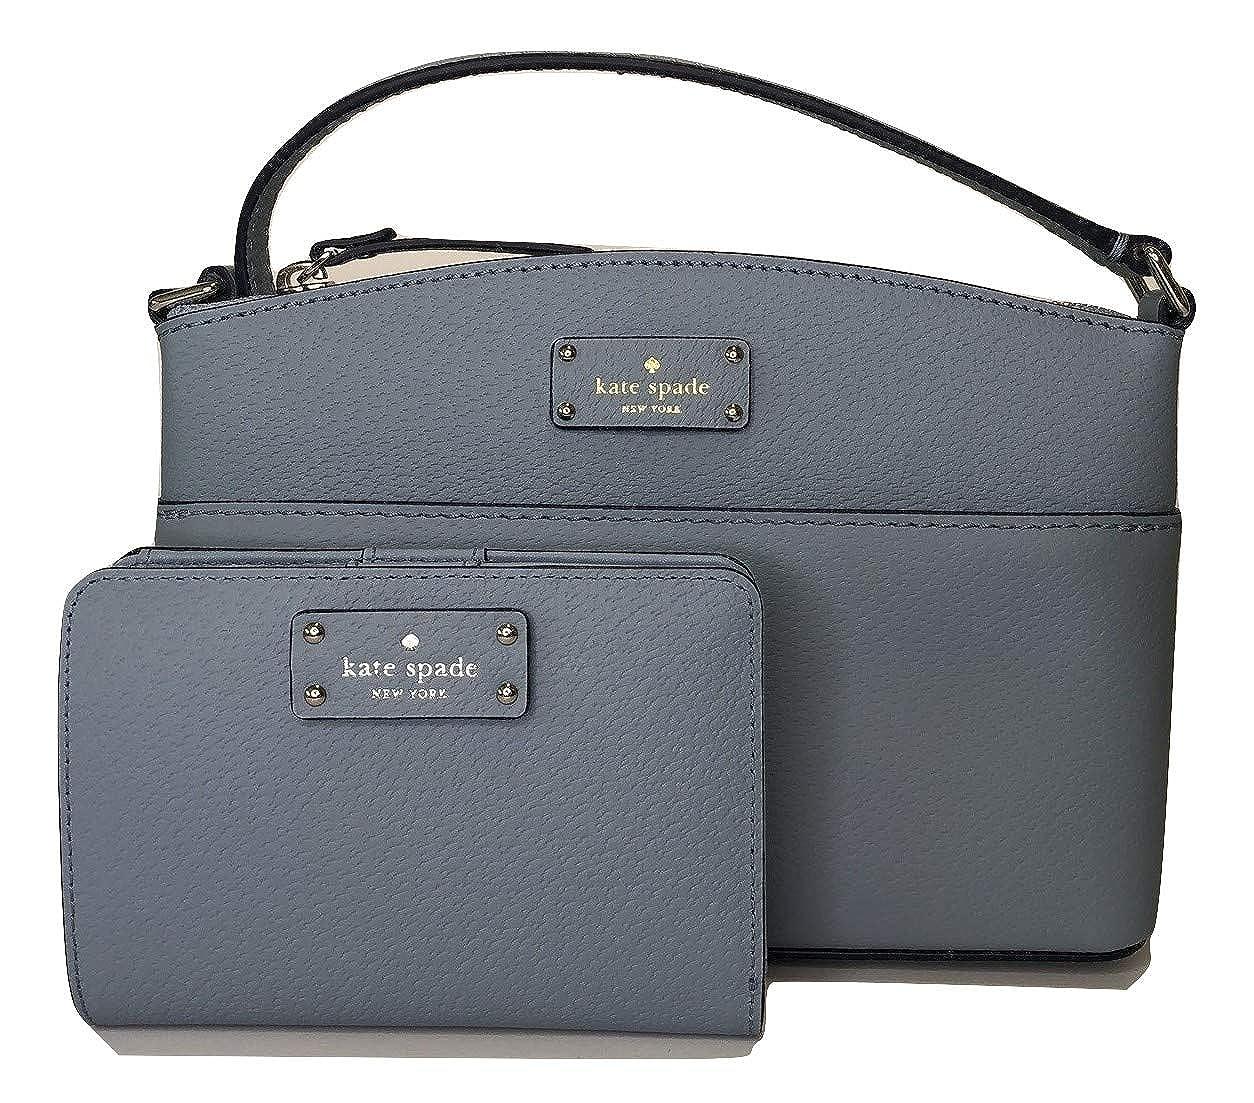 e3f8ebb62da71 Amazon.com  Kate Spade Grove Street Millie Crossbody Handbag bundled with  matching Tellie Card Wallet (Blue Dawn)  Shoes